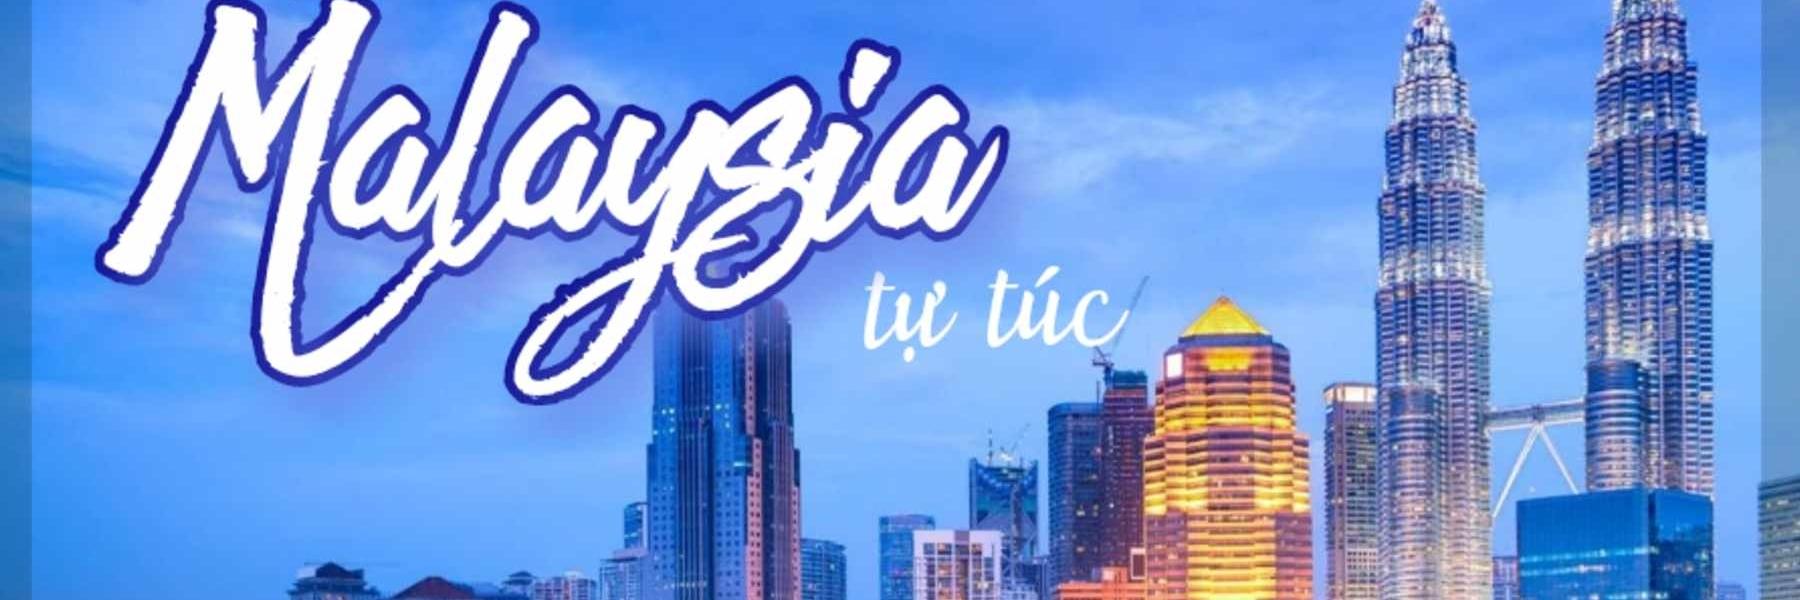 https://gody.vn/blog/lifeandgostudio4271/post/du-lich-malaysia-tu-tuc-24-gio-pha-dao-ca-kuala-lumpur-voi-tui-tien-tiet-kiem-4606